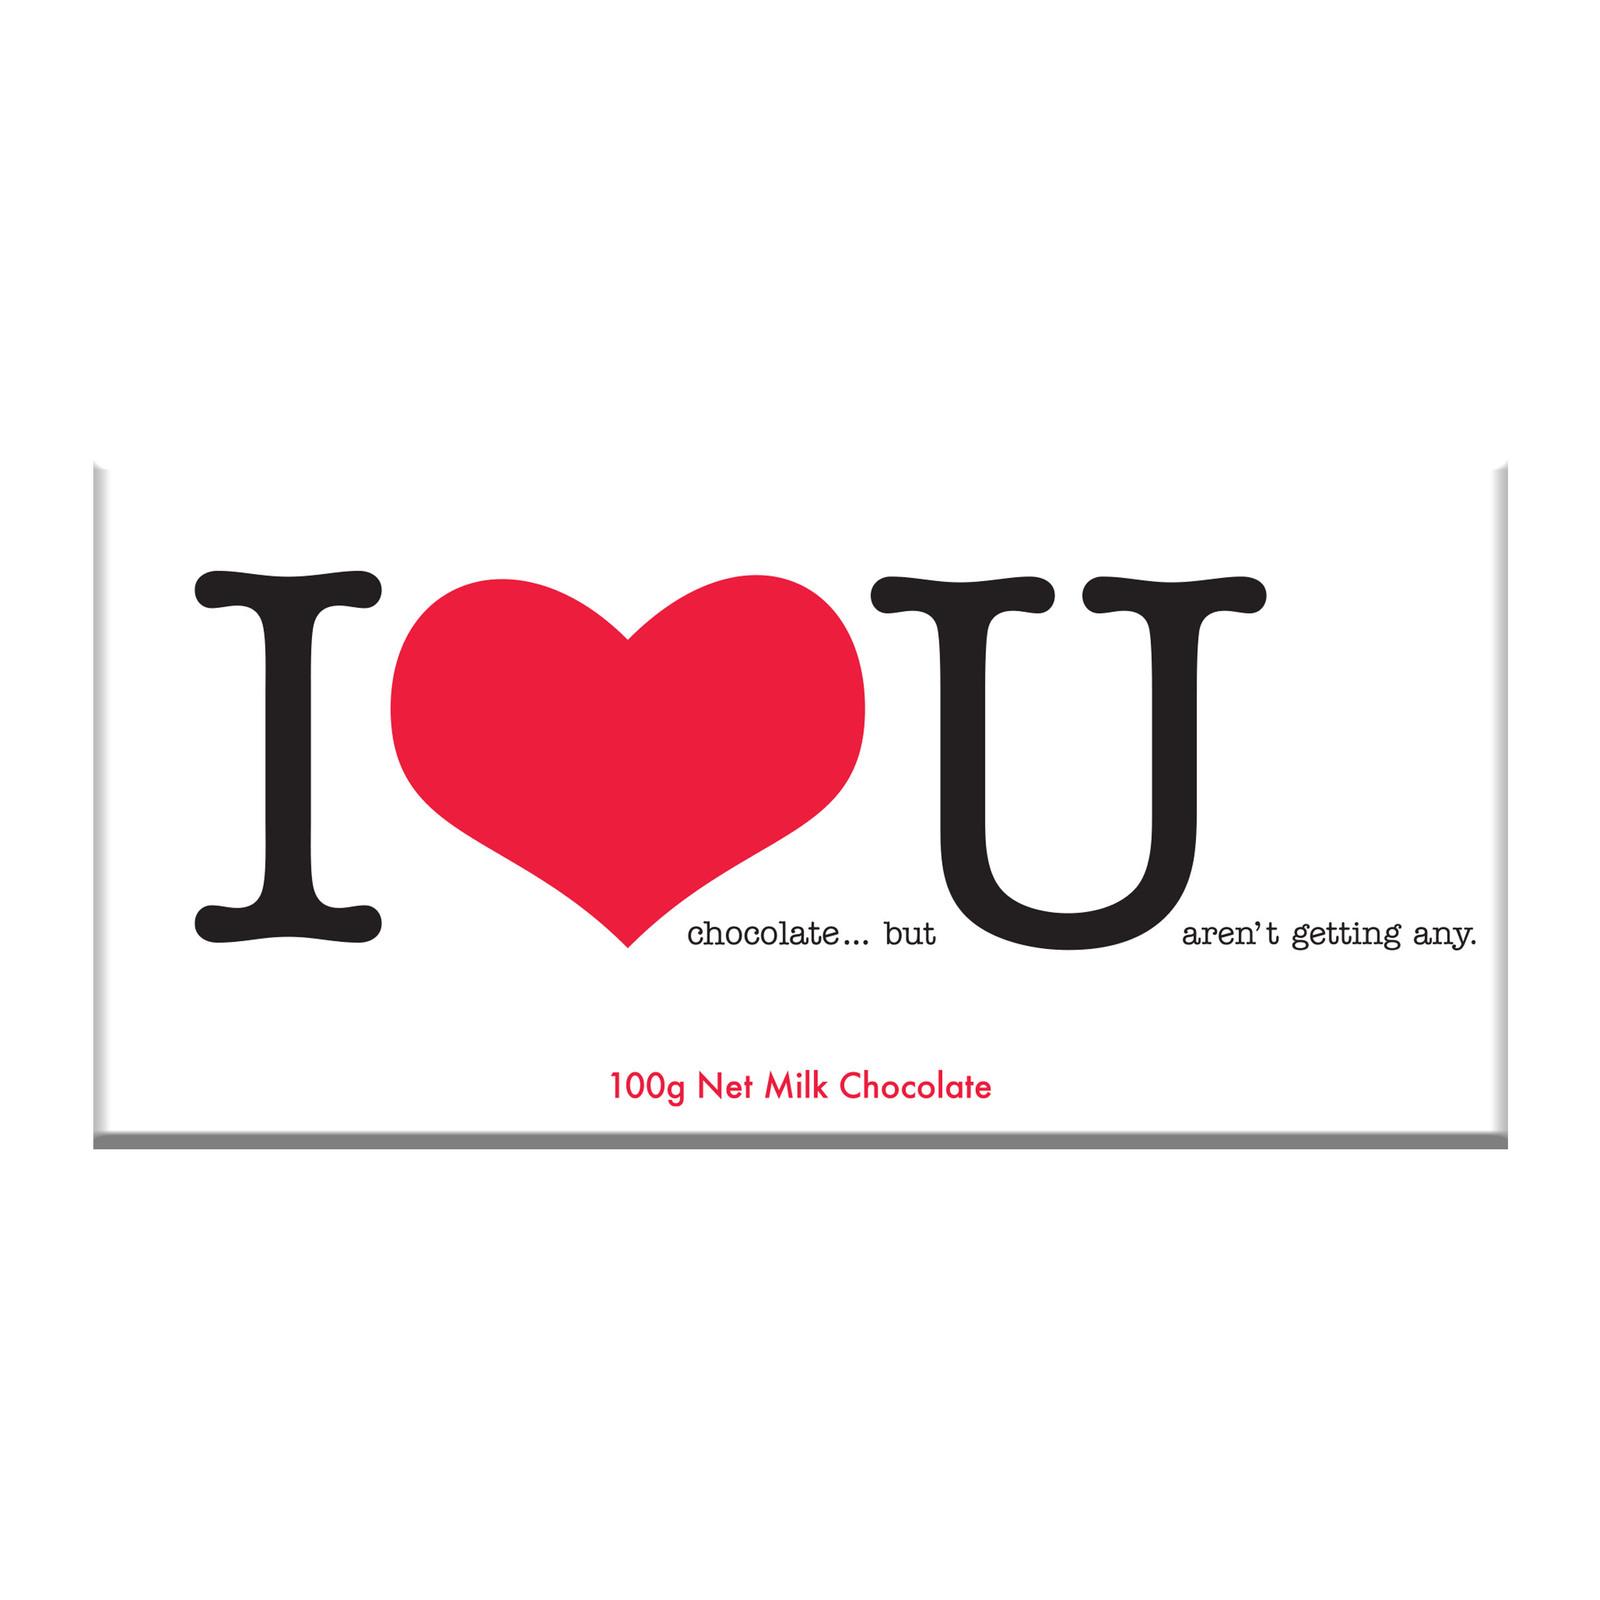 Bellaberry: I Love U Milk Chocolate (100g) image